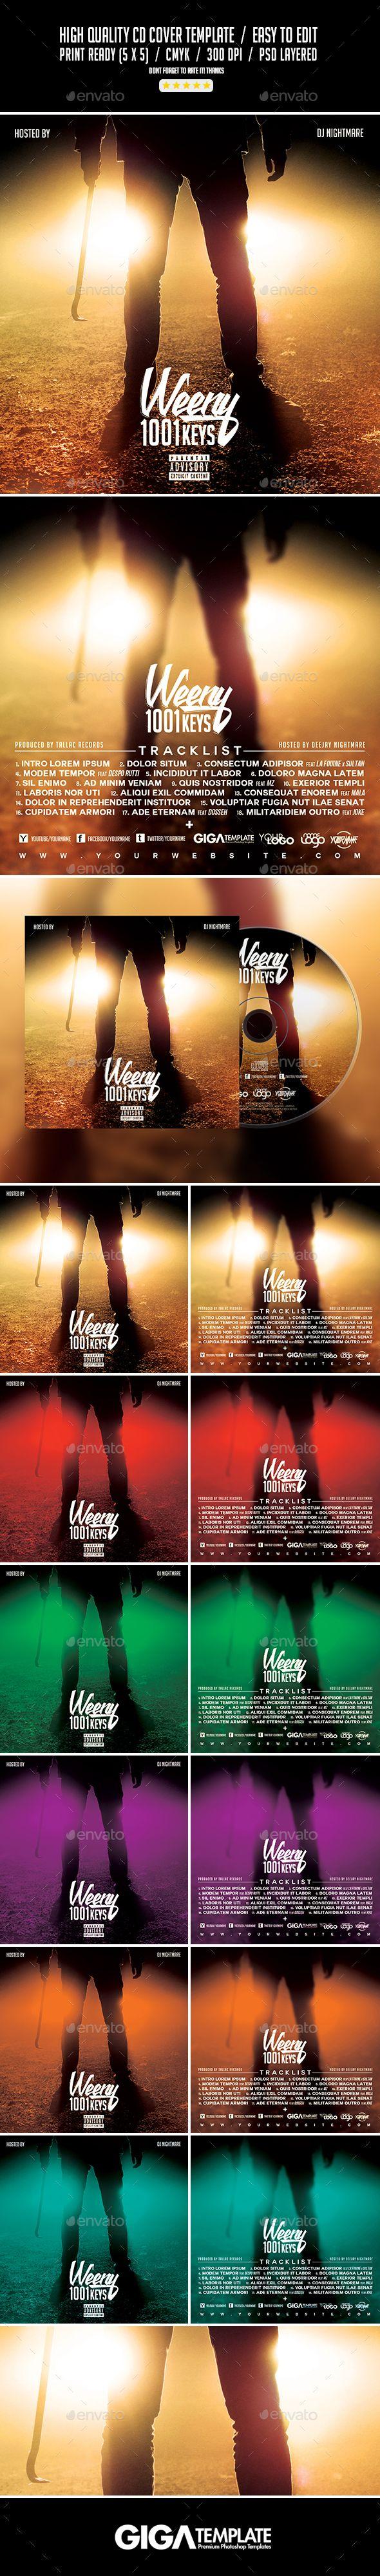 1001 Keys | Dark Album Music Mixtape CD Cover Template